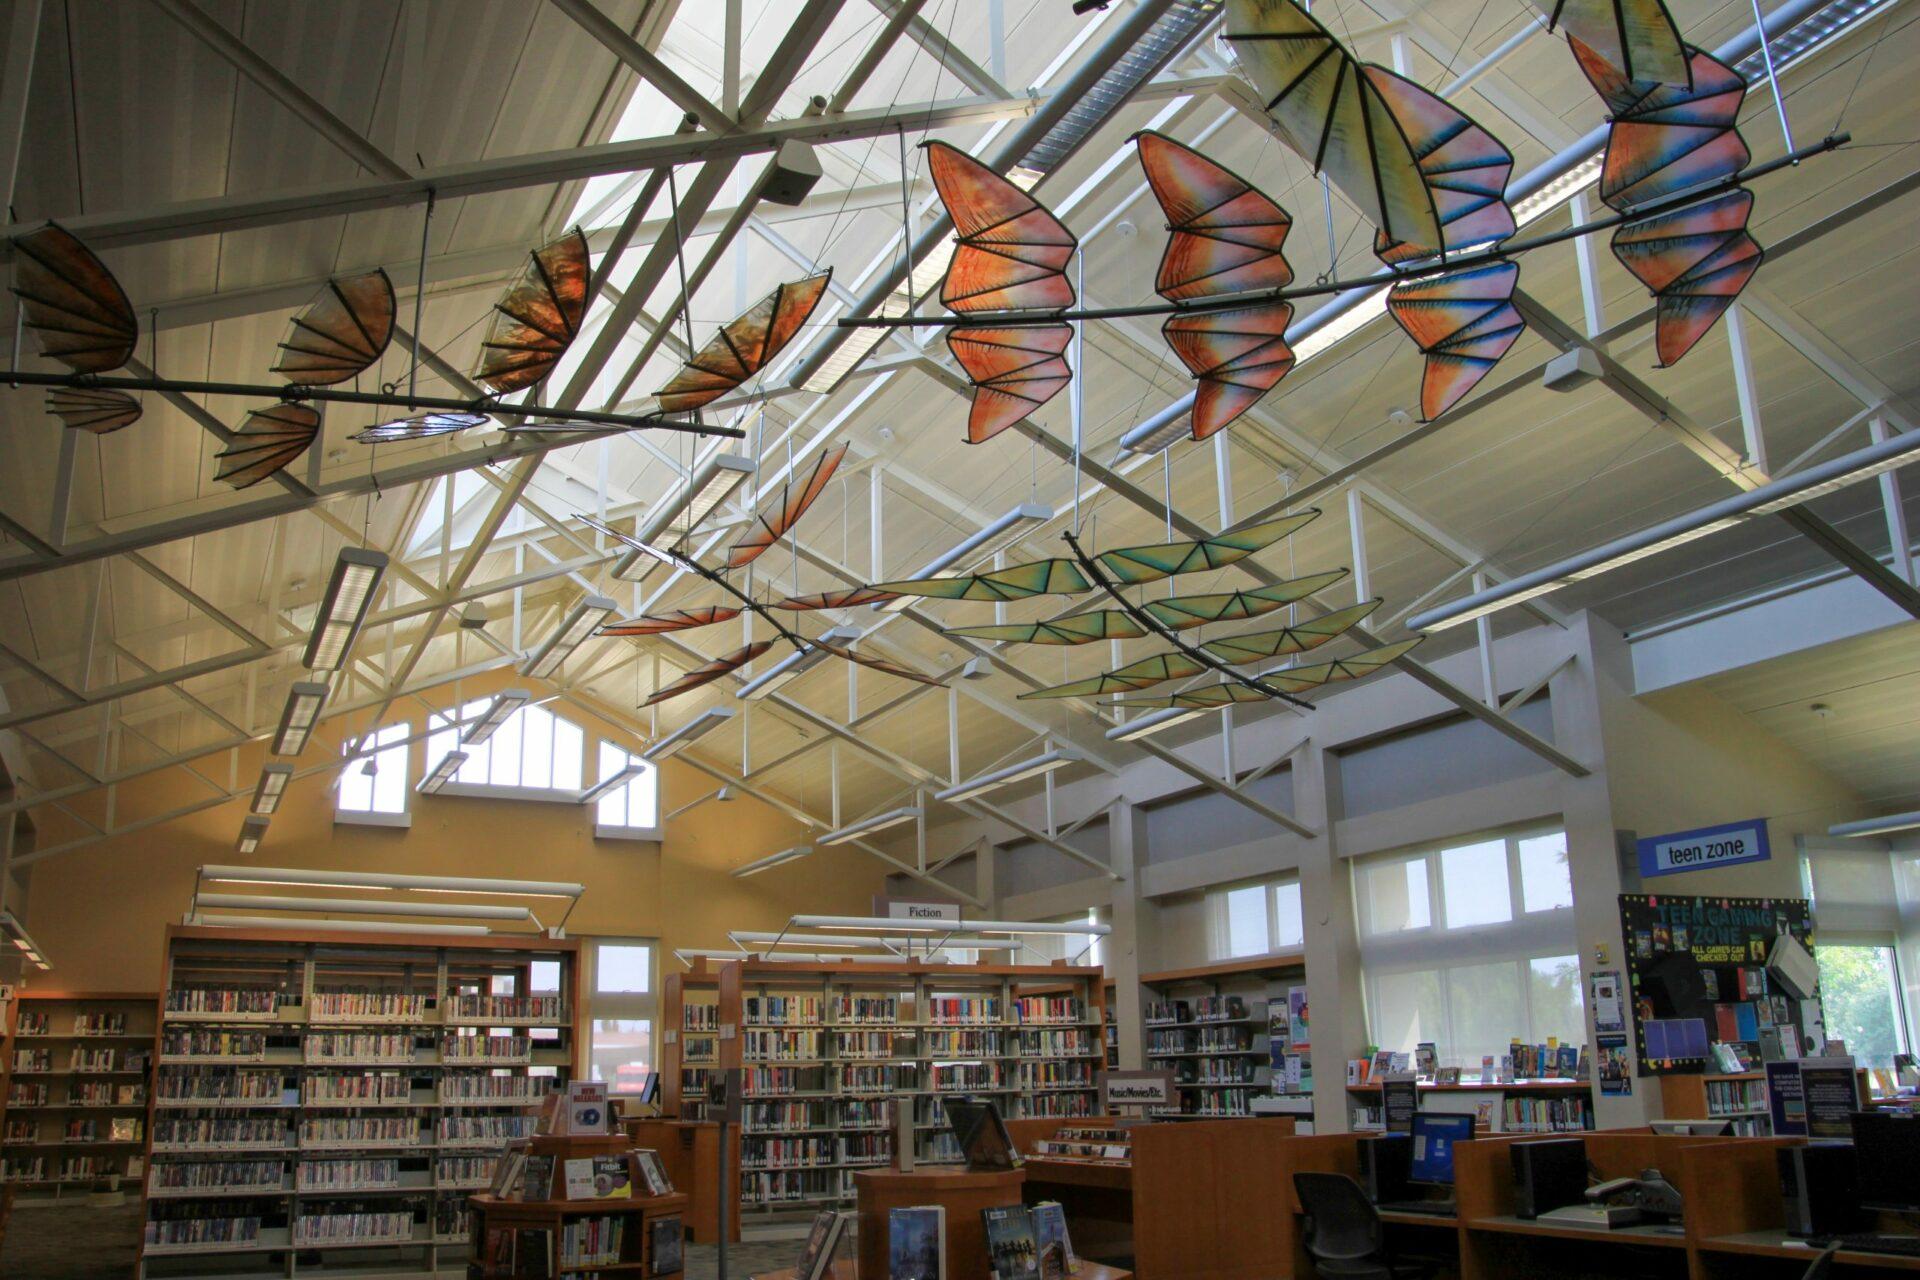 Art Installation In Suisun City Library.